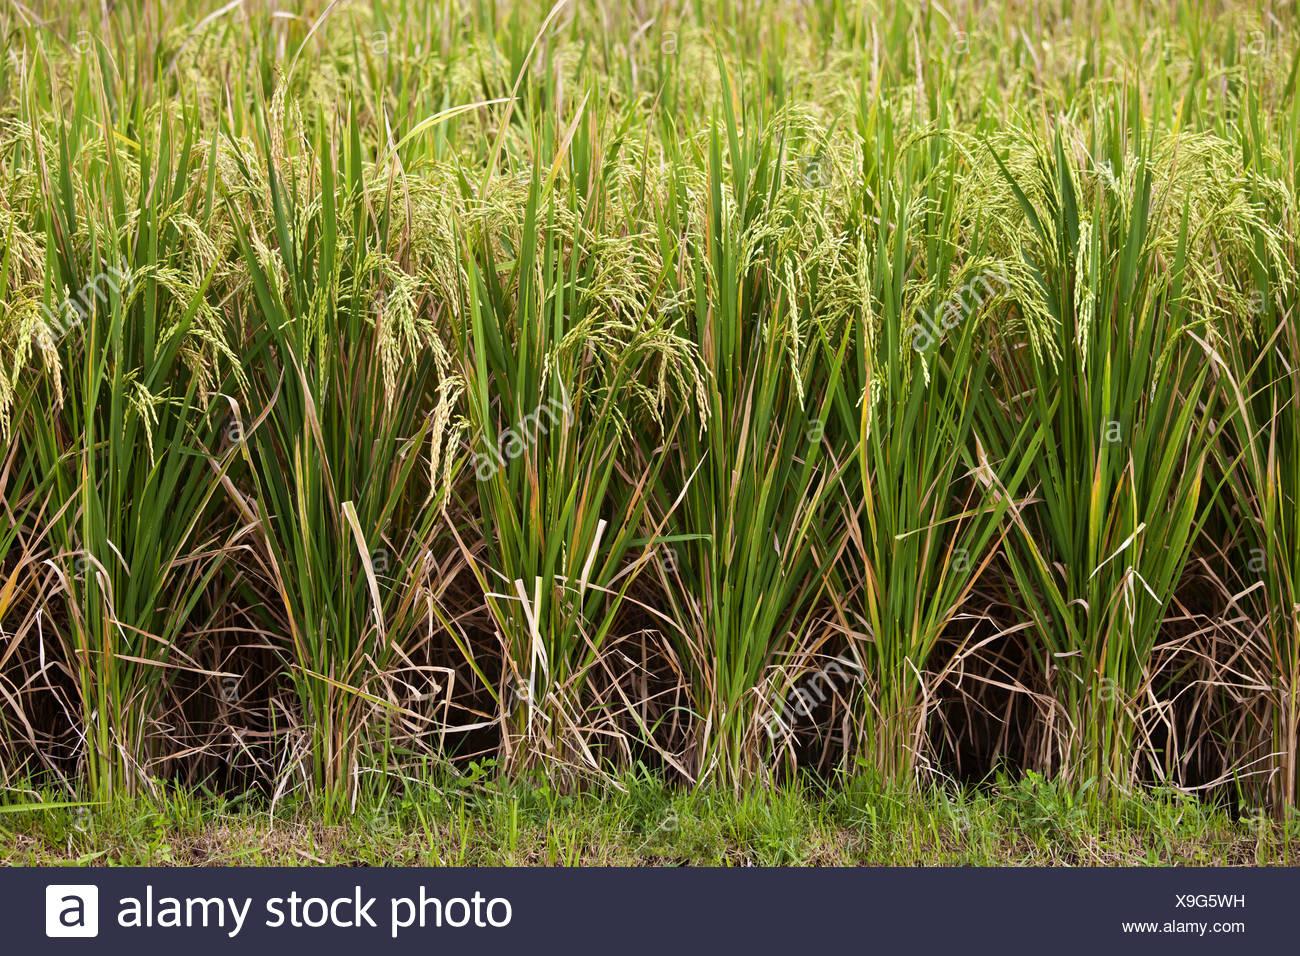 common rice (Oryza sativa), rice field, Indonesia, Bali - Stock Image